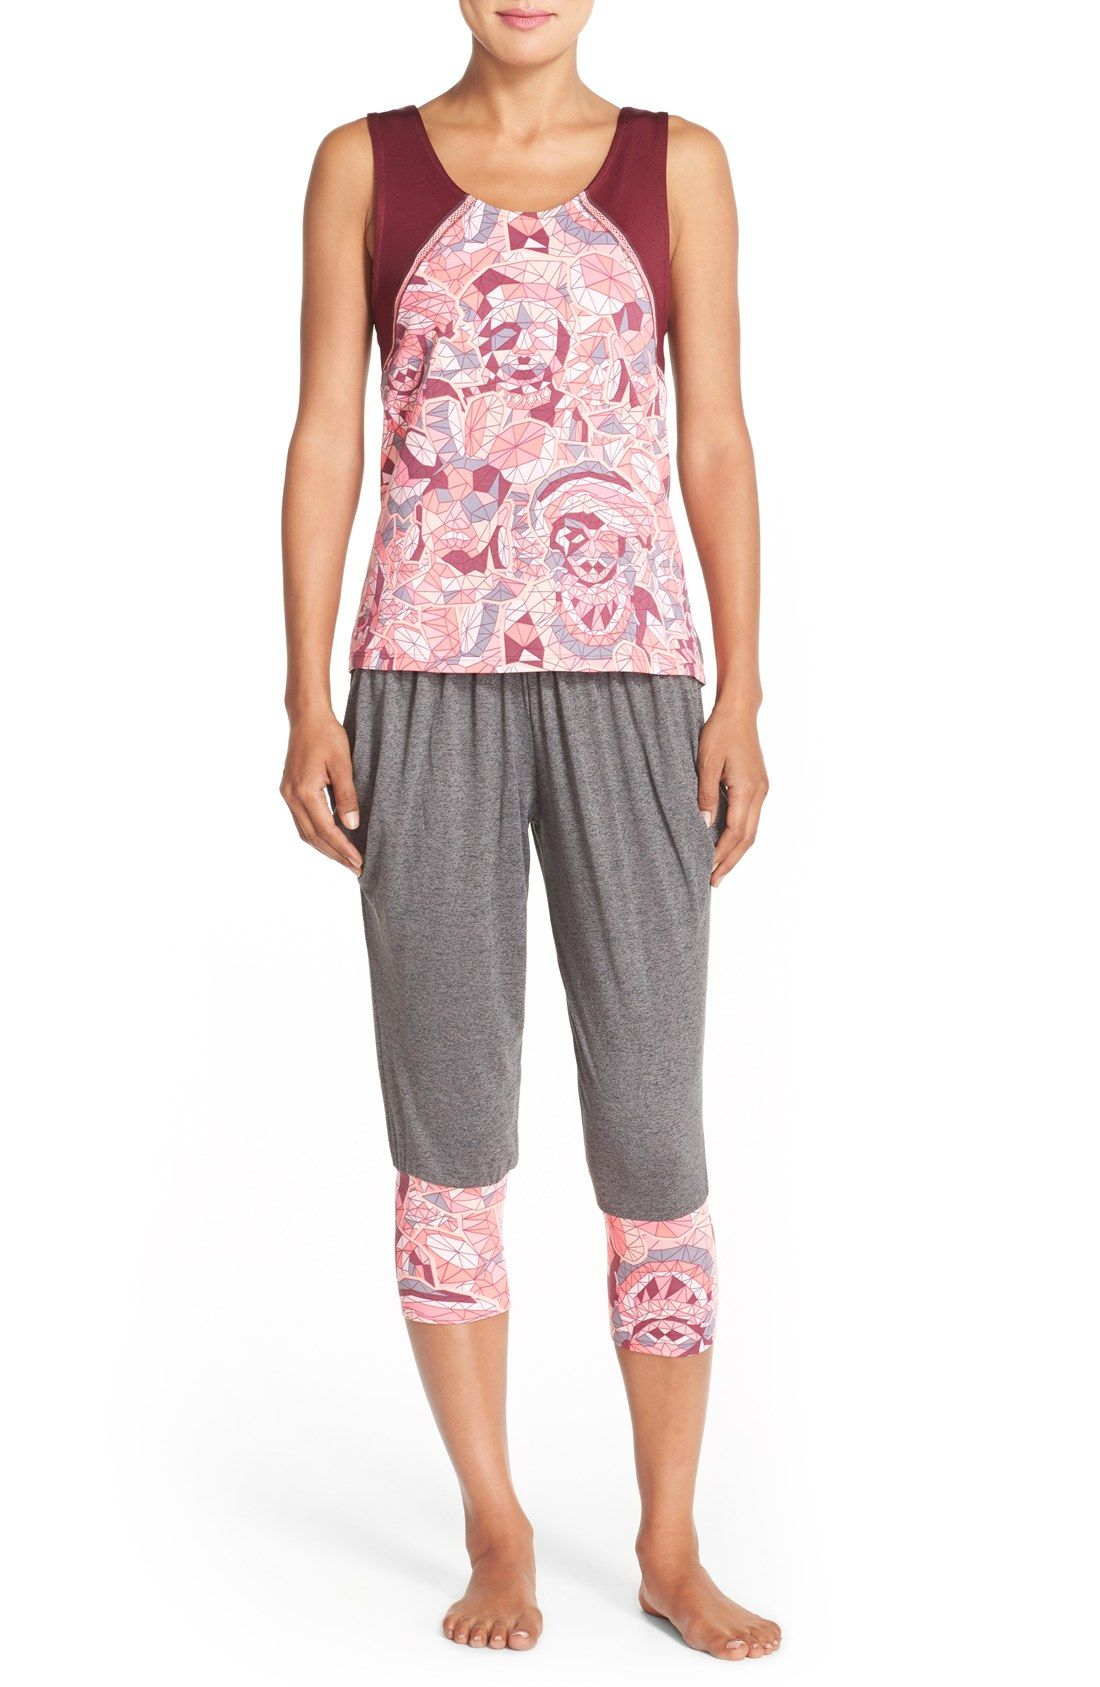 54f84adbc766e Maaji 'Breezy Om' Crop Yoga Pants | Lisa's faverites | Yoga Pants ...